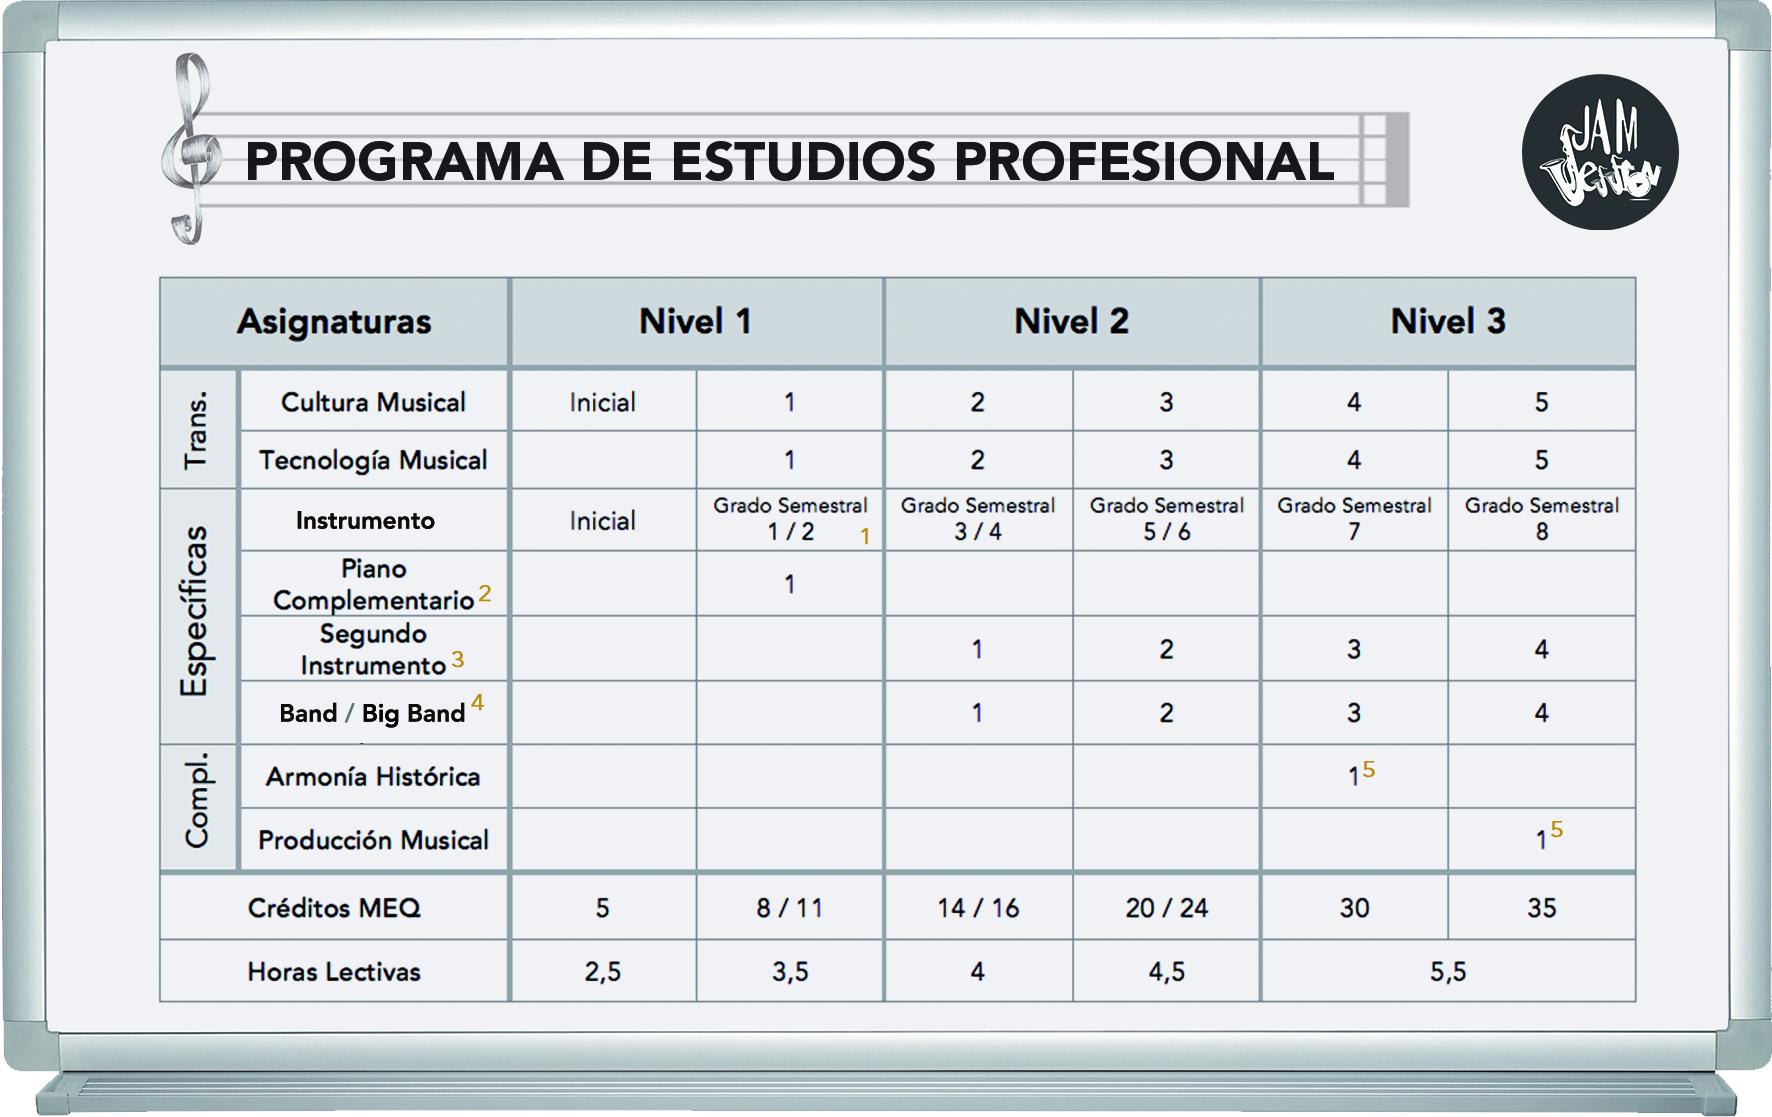 Programa de estudios profesional (cast) 4